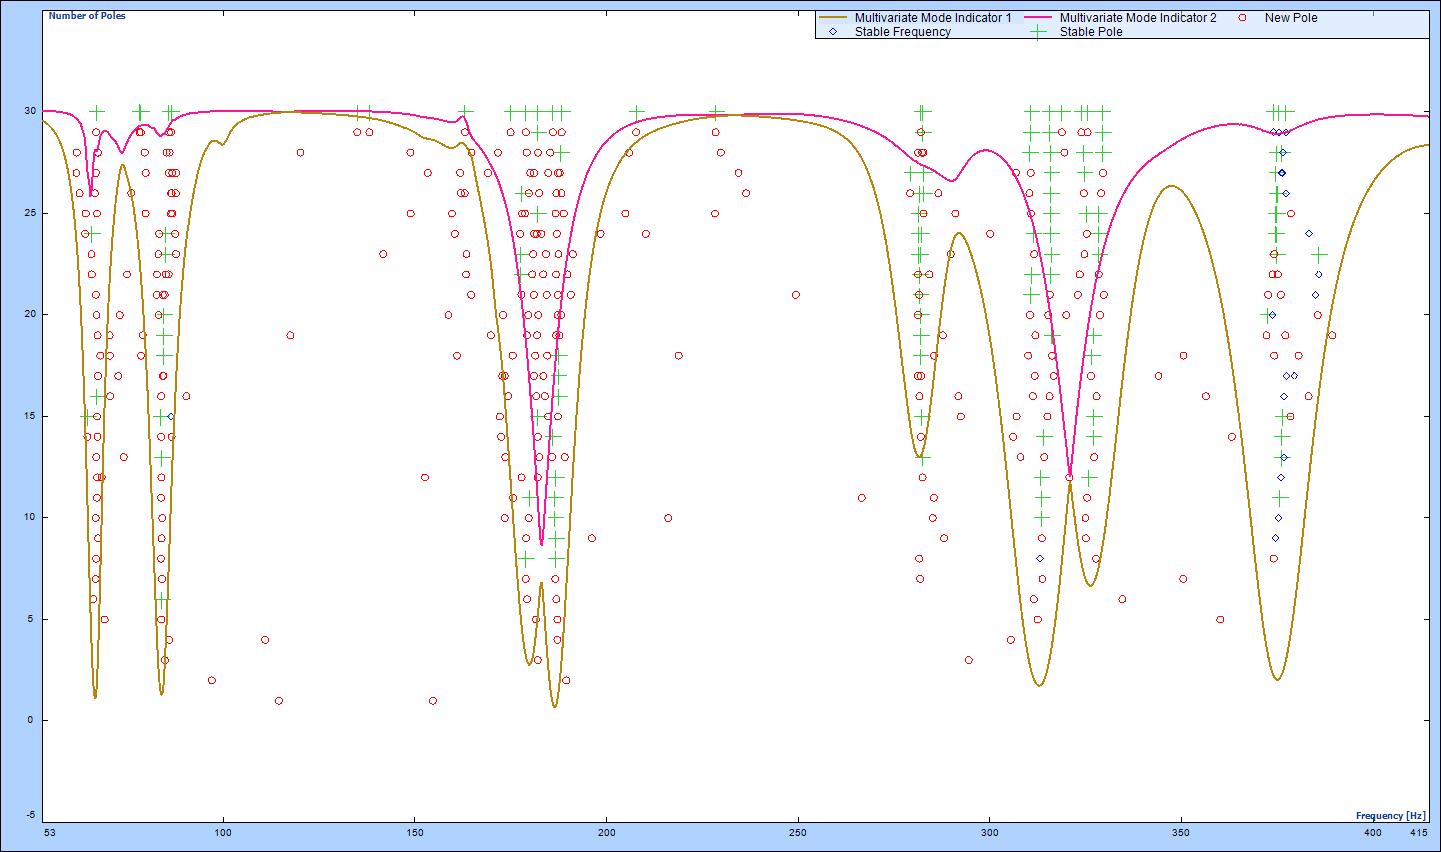 Figure 3.3: Stability diagram using PTD estimator